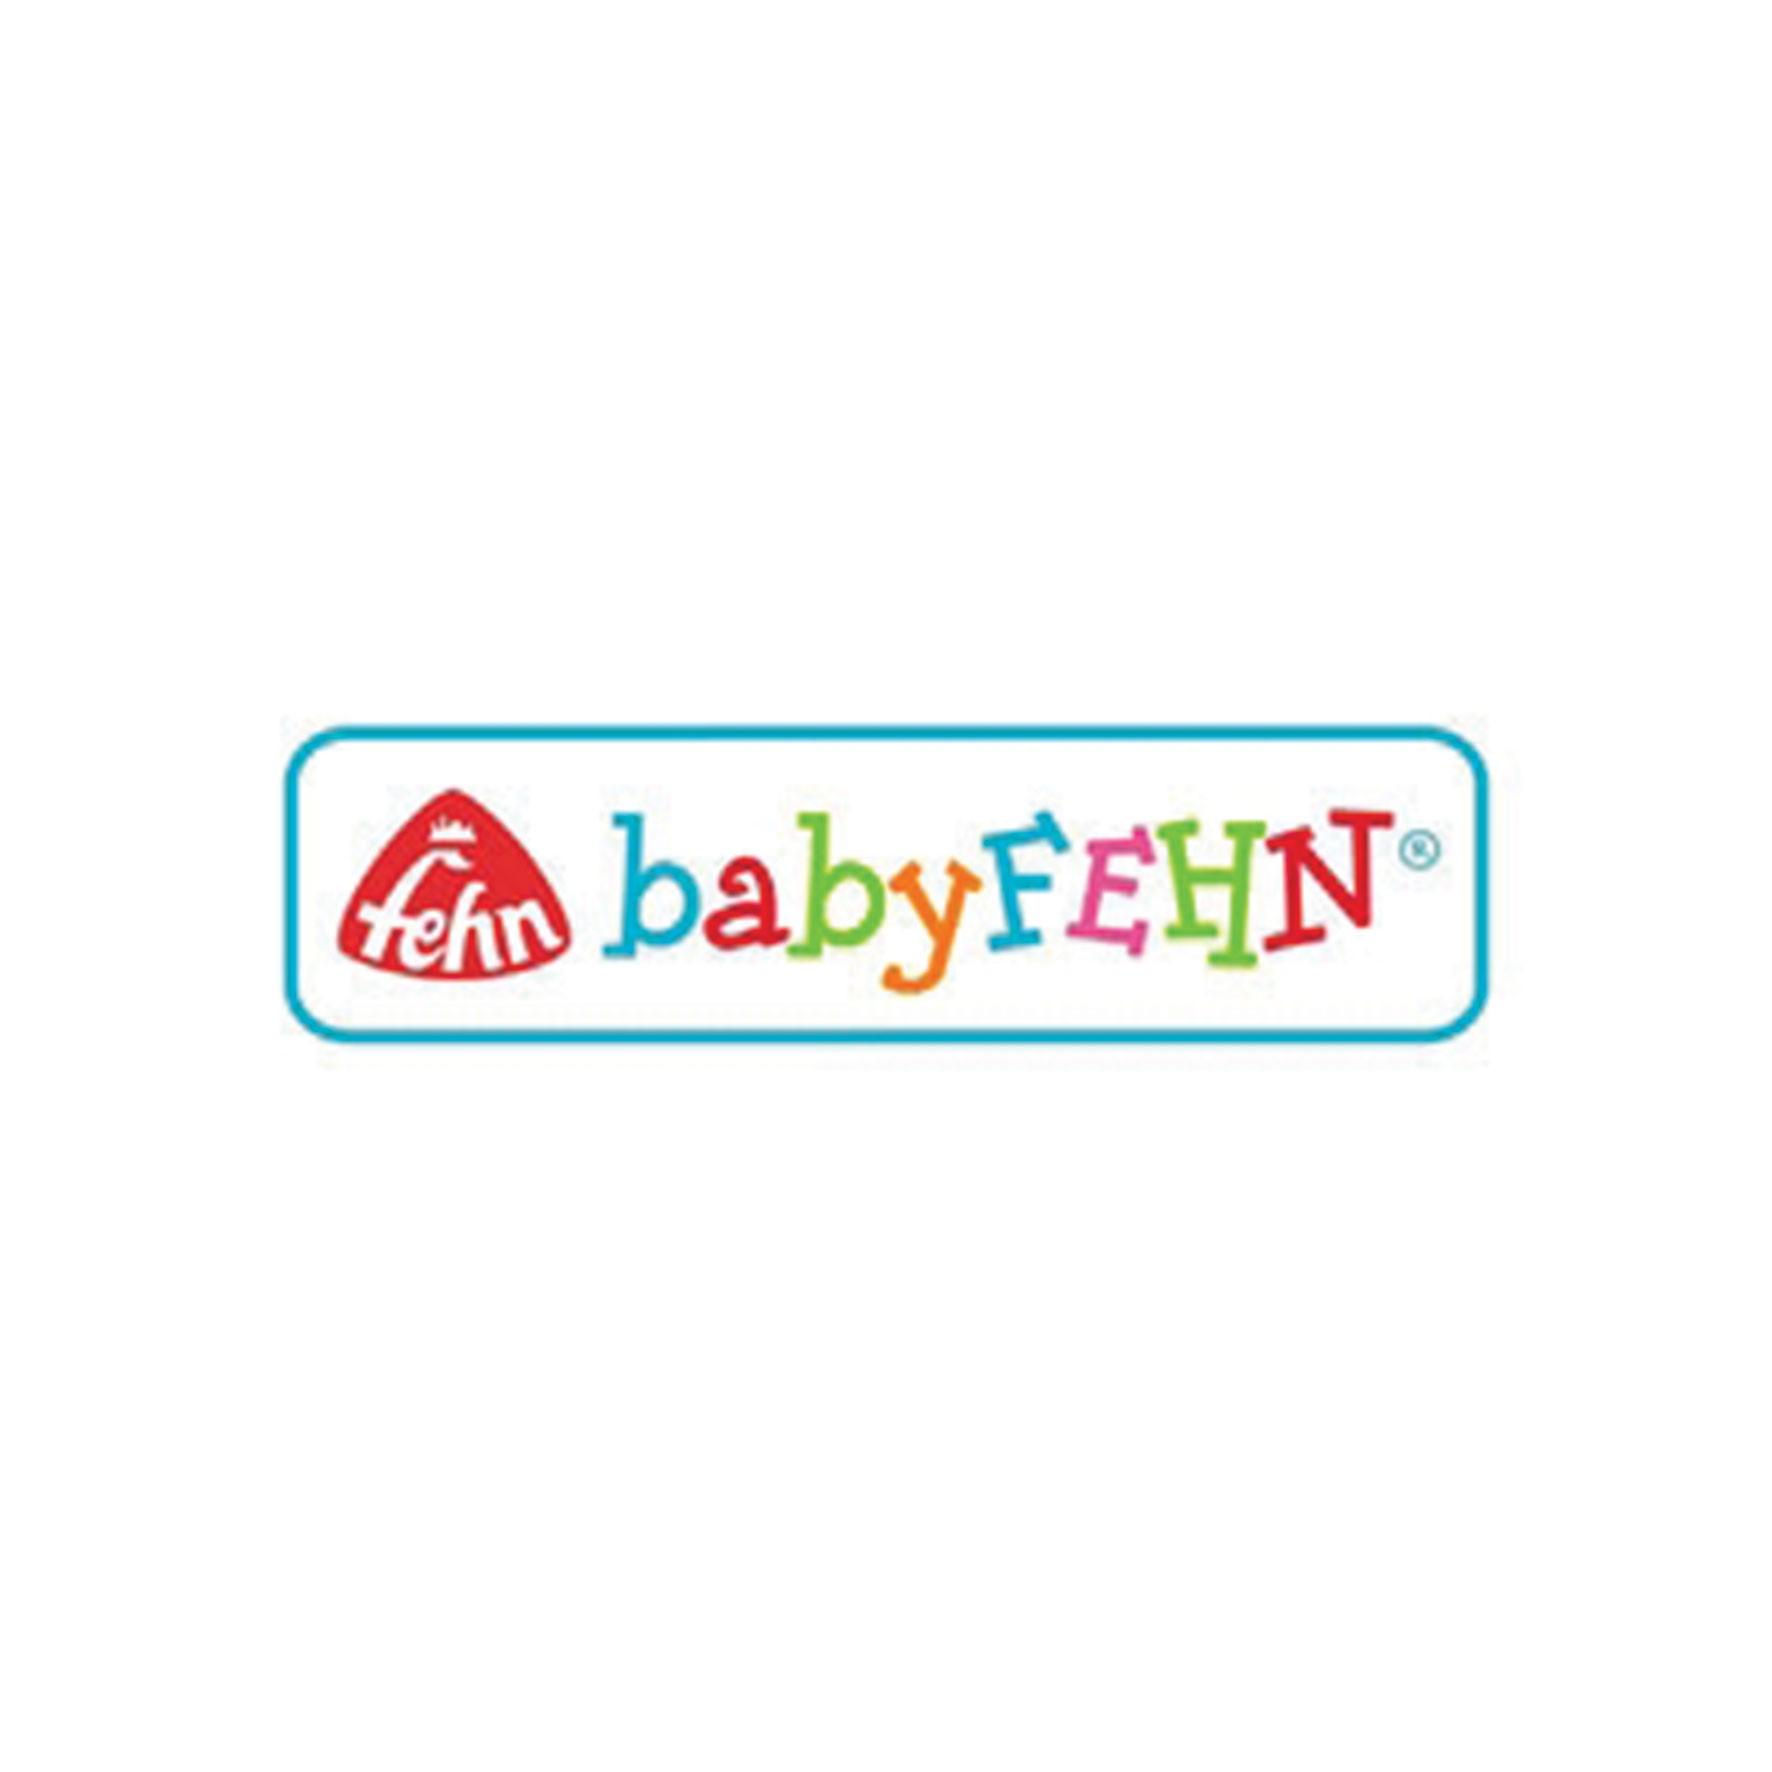 BABY-FEHN